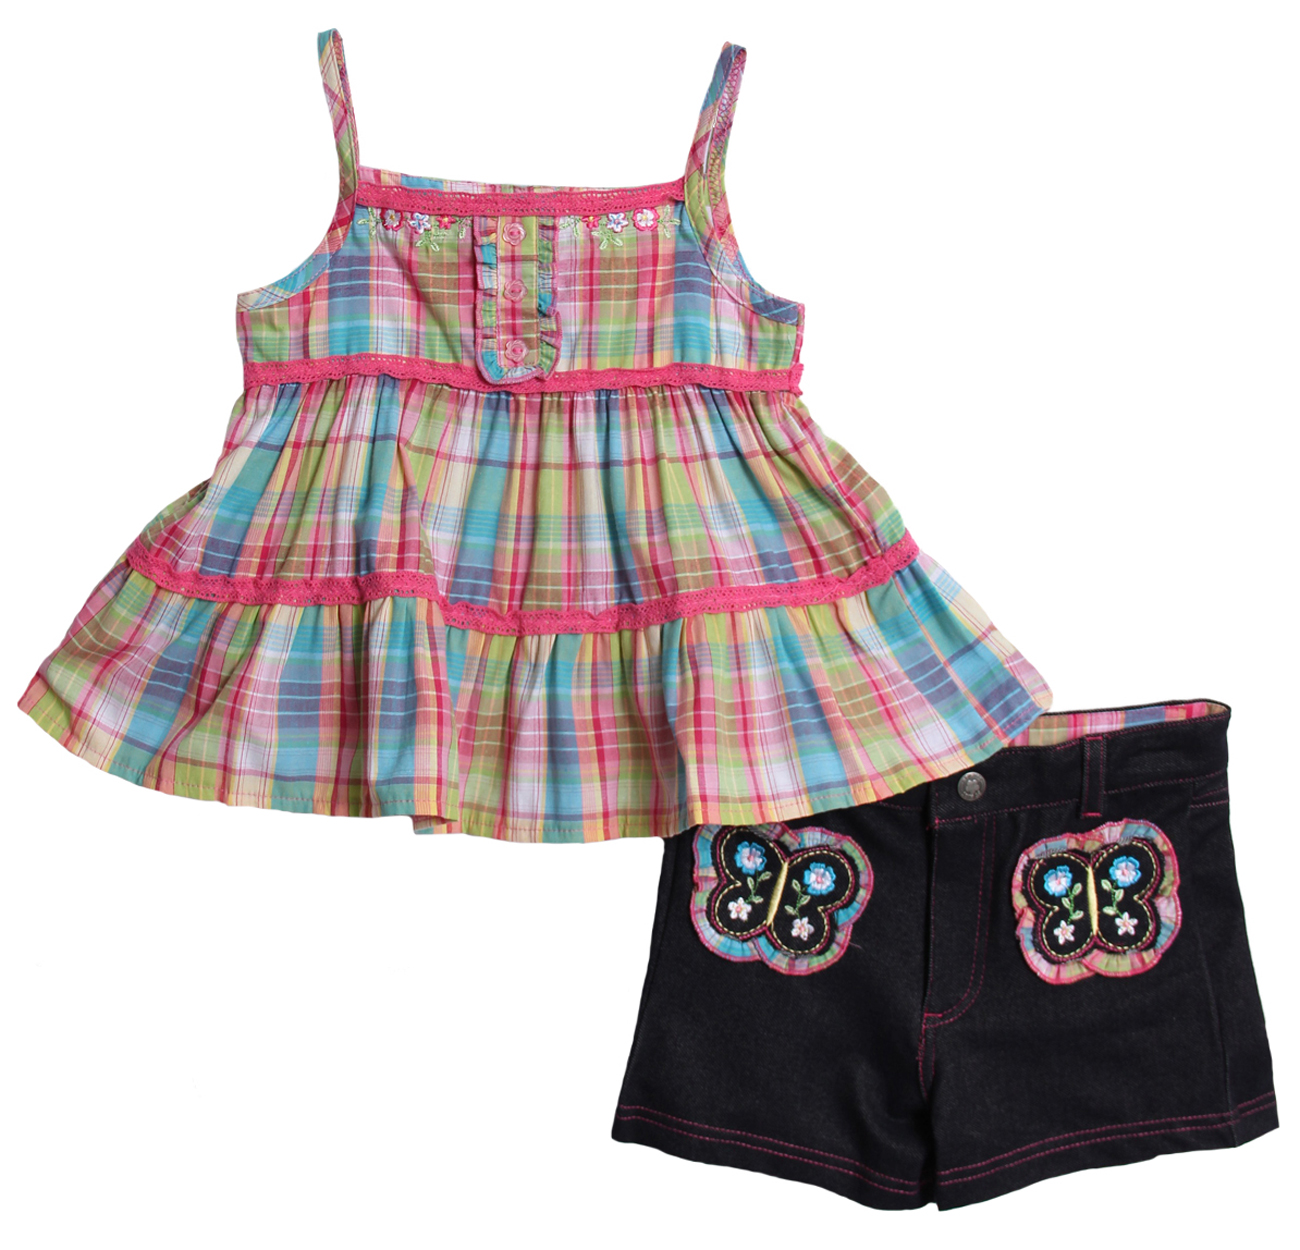 B.T. Kids Baby Girls' 2 Piece Pink Plaid Tank Top Denim Butterfly Shorts at Sears.com